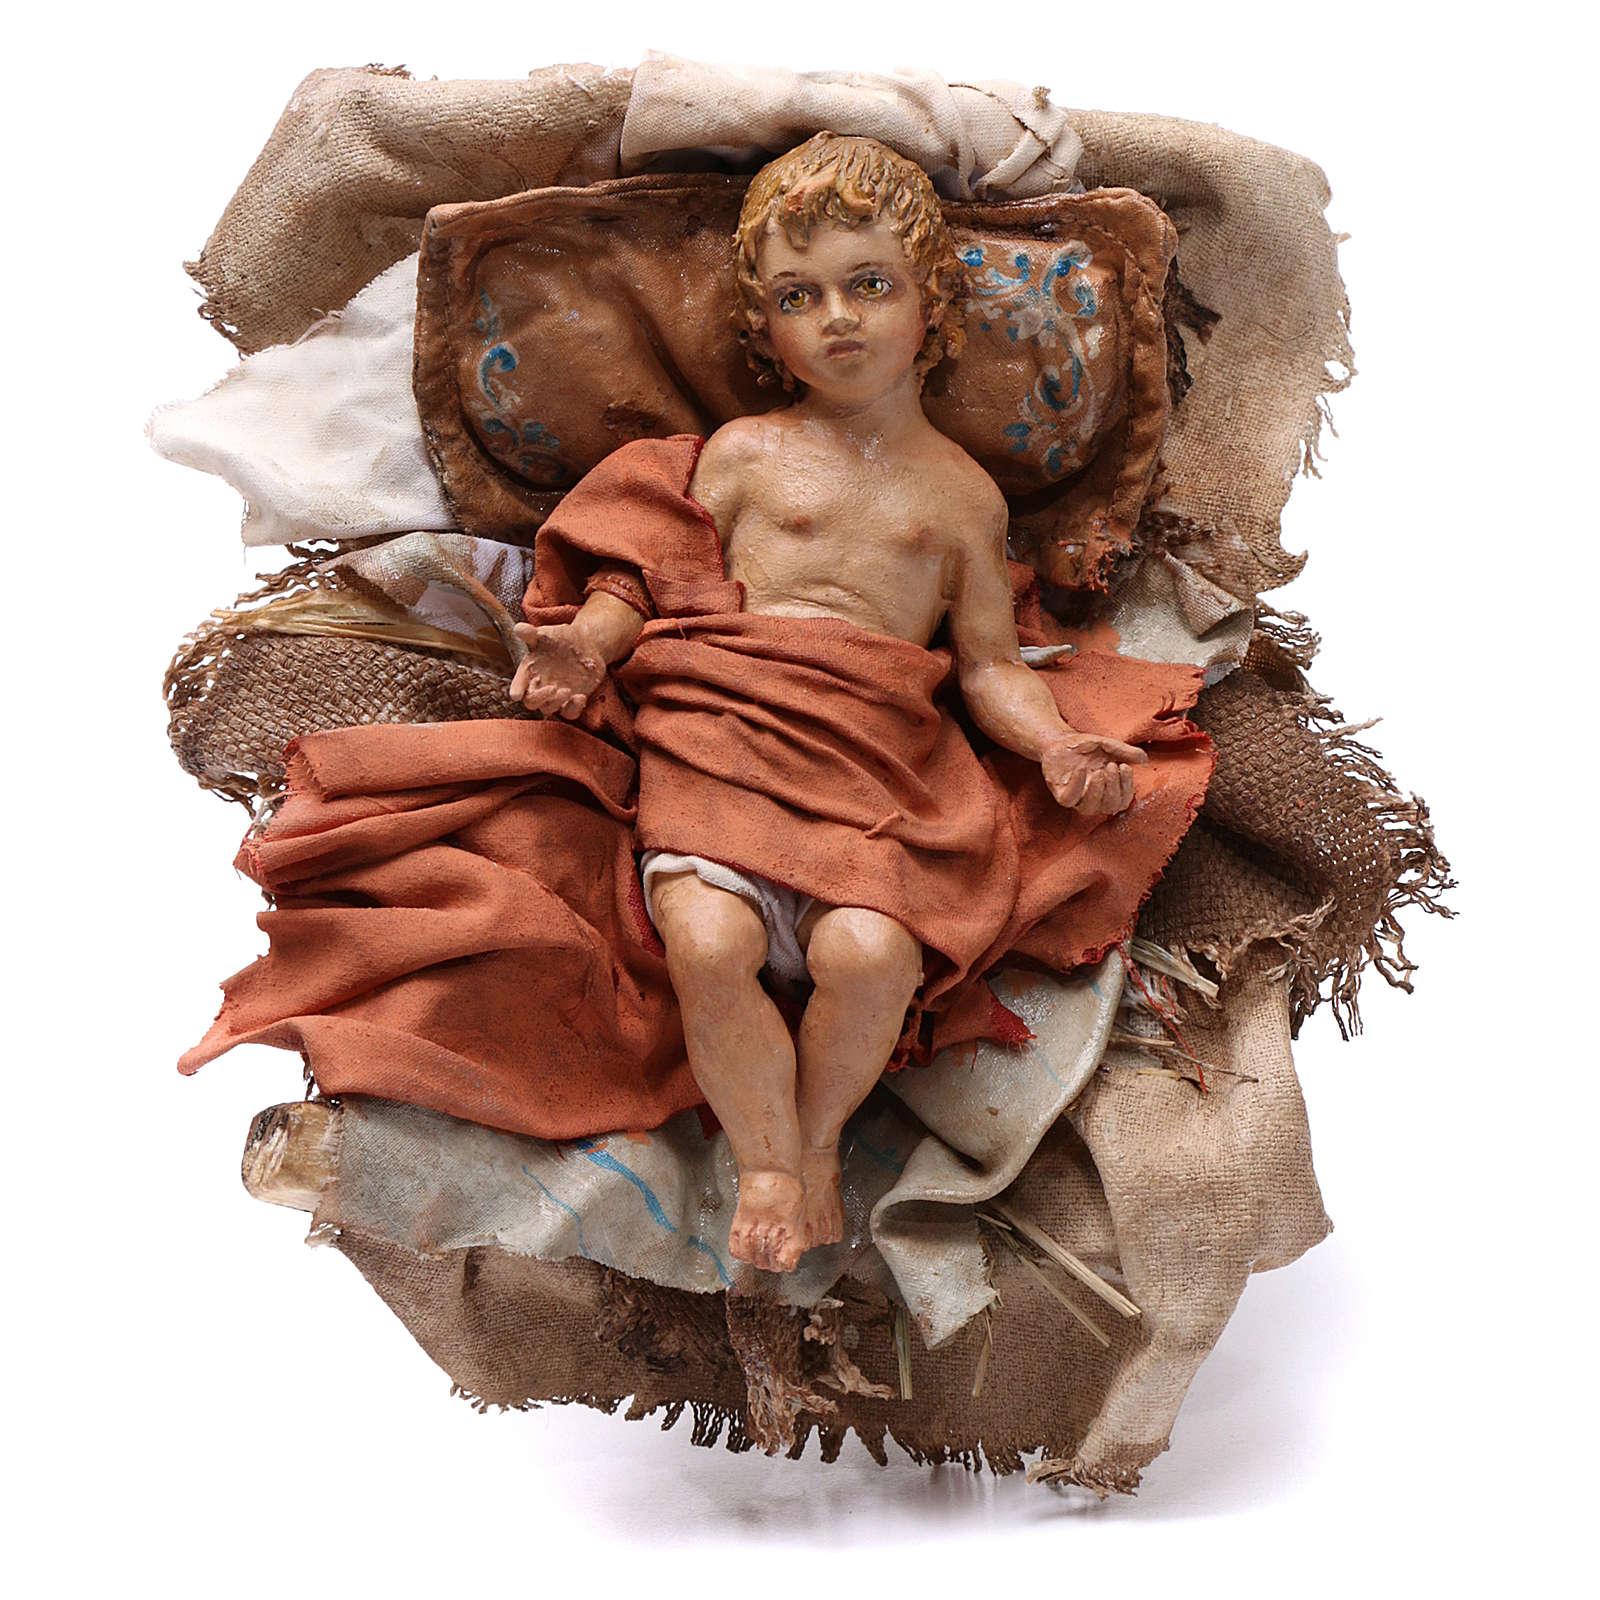 Natività 3 pz con Madonna seduta presepe Angela Tripi 30 cm 4